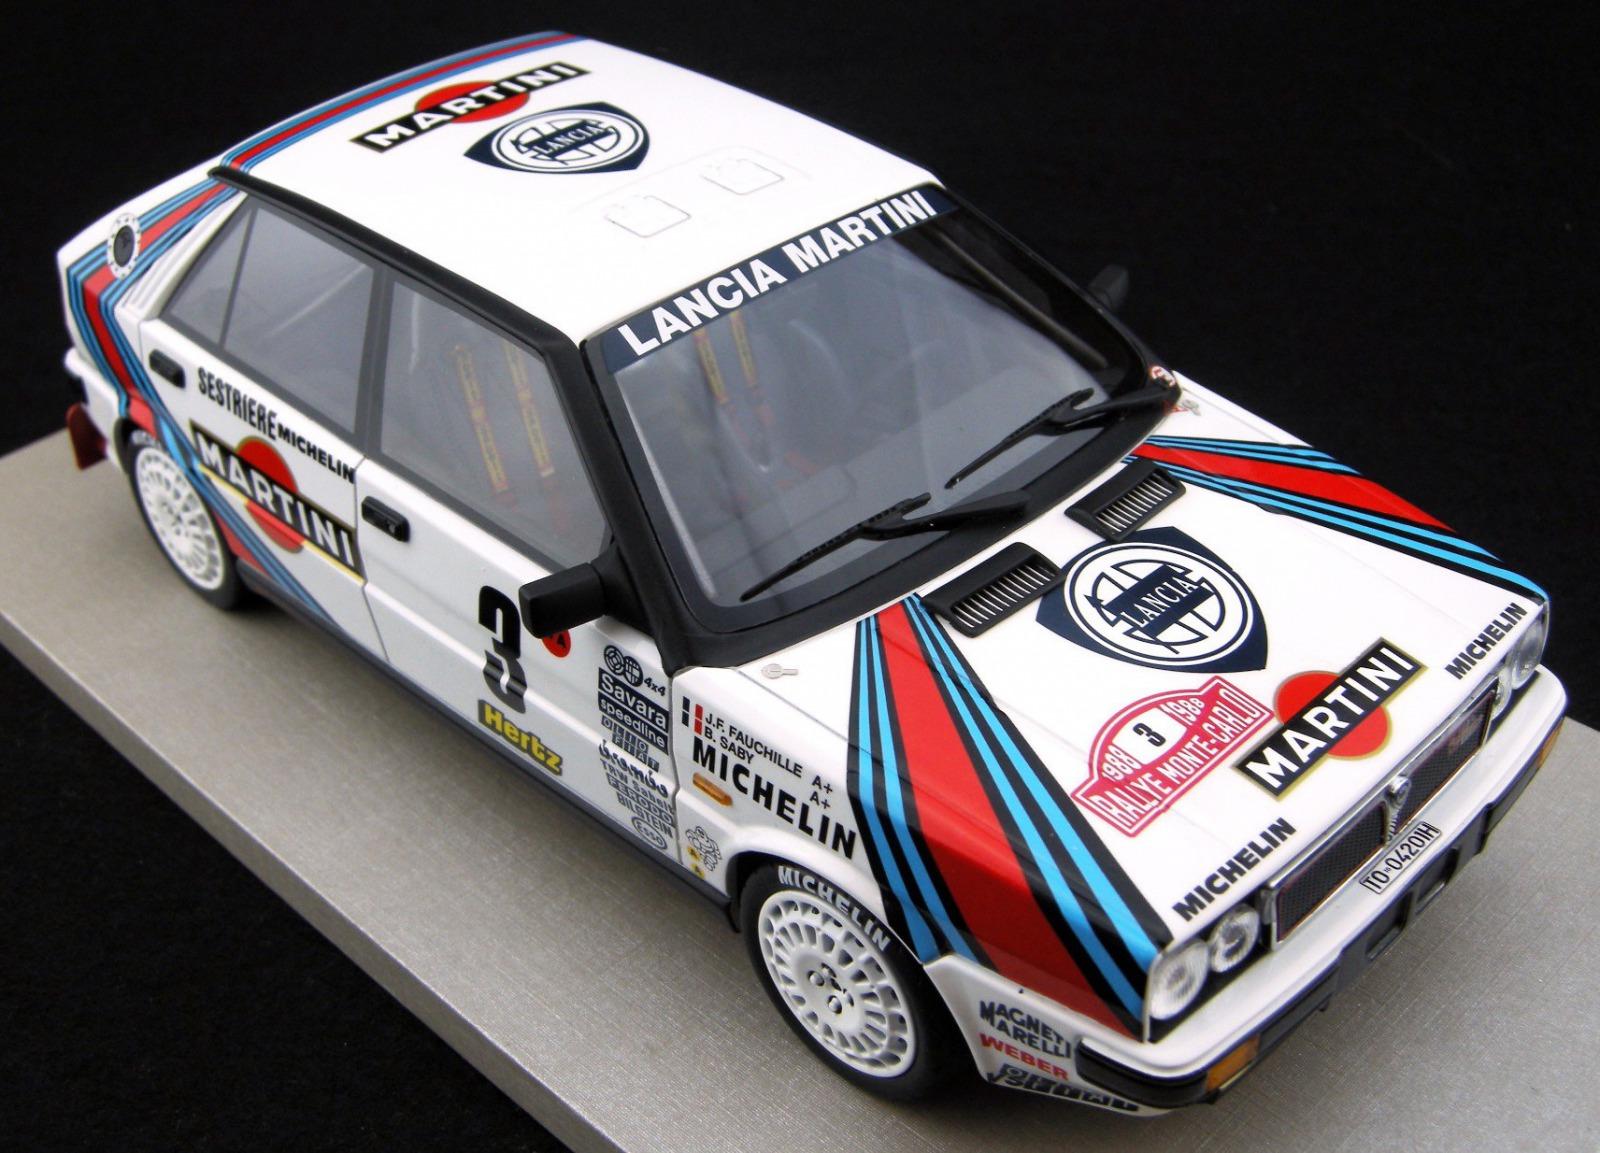 Topmarques 1:18 1988年ラリーモンテカルロ優勝モデル ランチア デルタ 4WD No.3TOPMARQUES LANCIA DELTA 4WD MARTINI N 3 WINNER RALLY MONTECARLO 1988 J.F.FAUCHILLE B.SABY